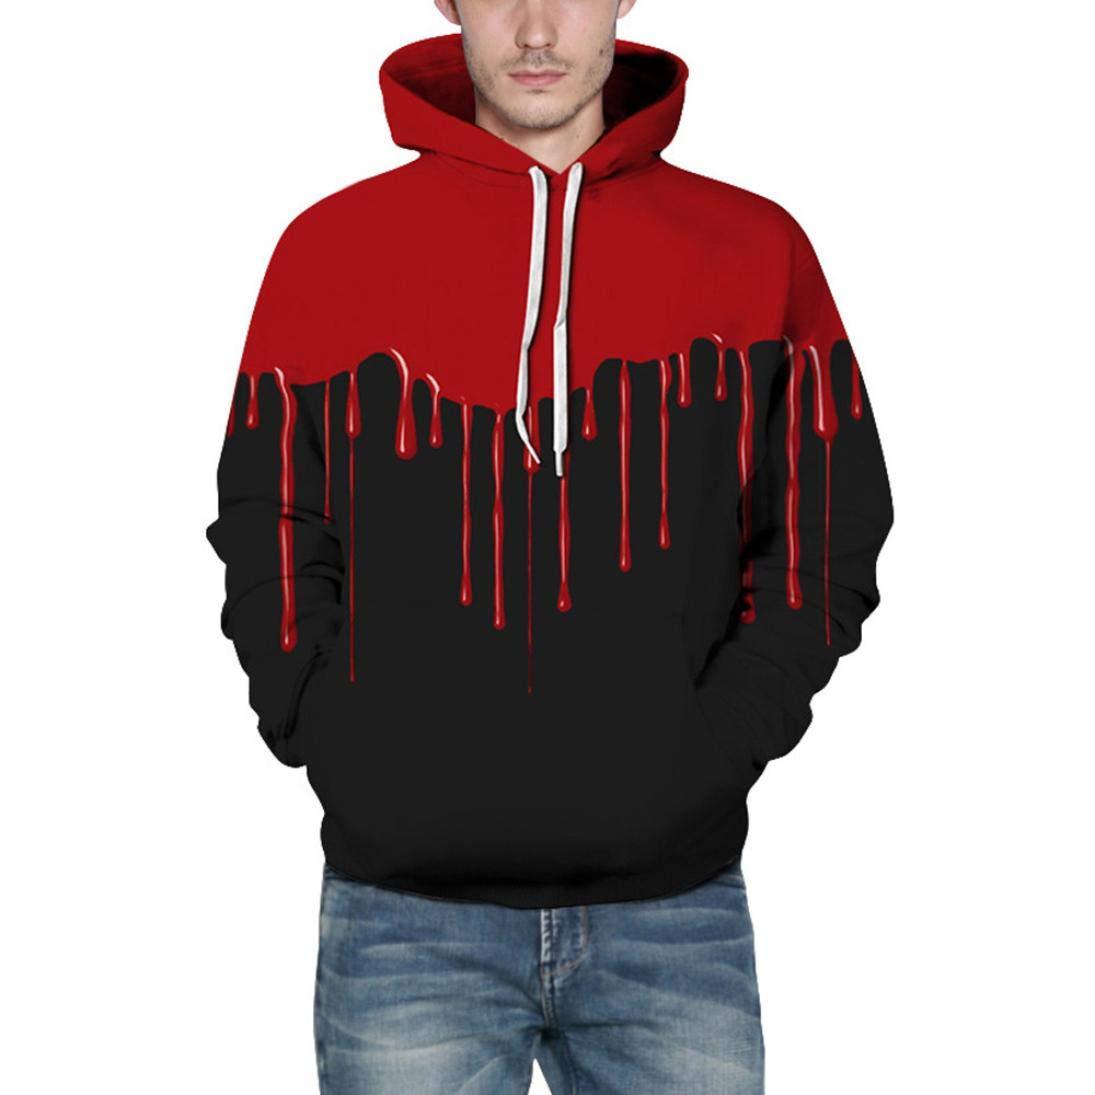 Men's Jackets & Coats, Sweatshirts for Men Hoodie, Loves' Casual Autumn Winter 3D Printing Long Sleeve Hoodies Sweatshirt Blouse (Black, 2XL/3XL)